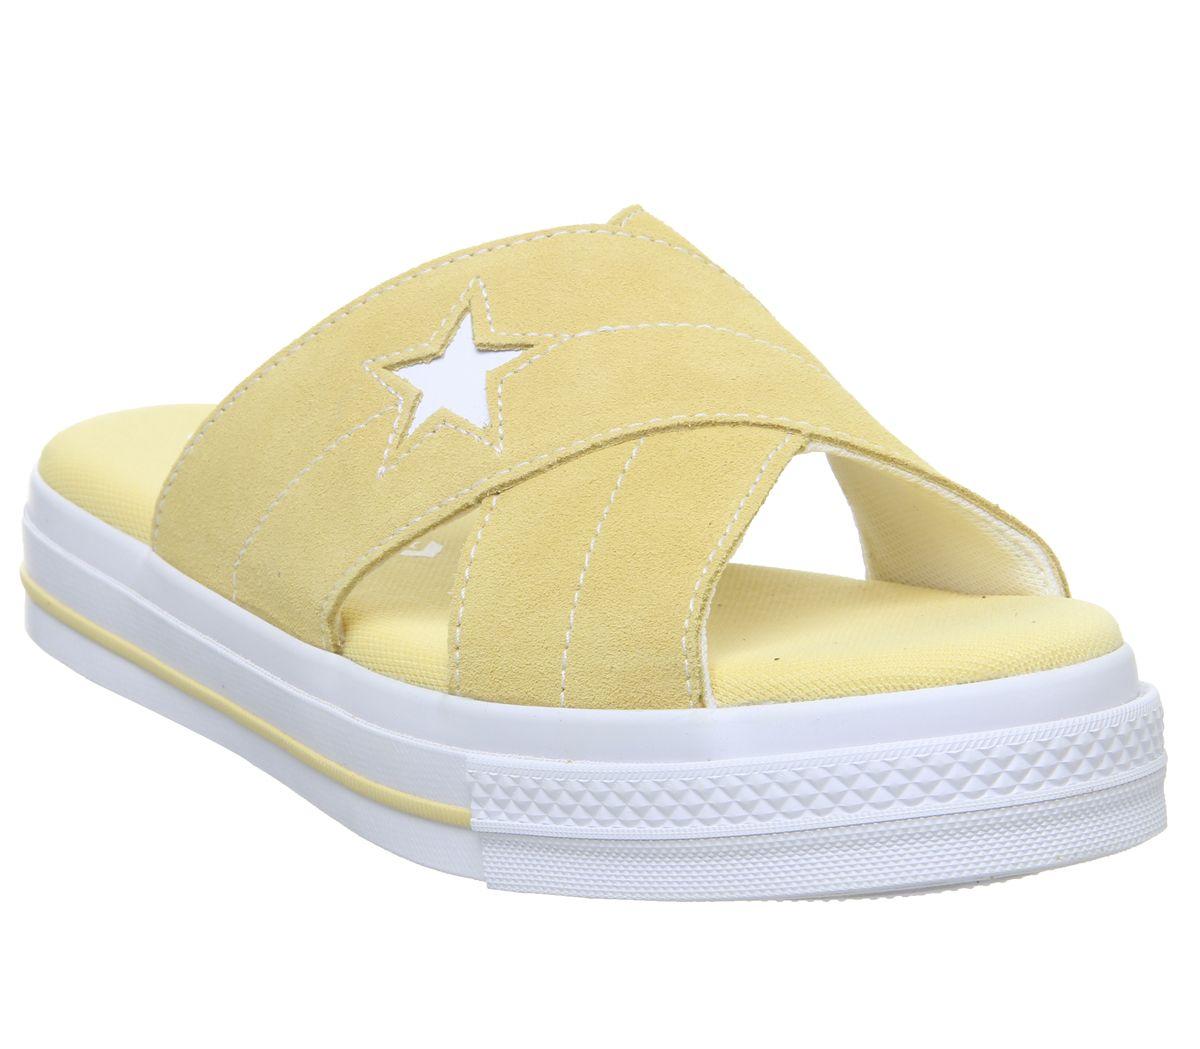 Detalles One Mujer De Amarillo Egret Converse Blanco Star Sandalias Butter y8ONn0vmw